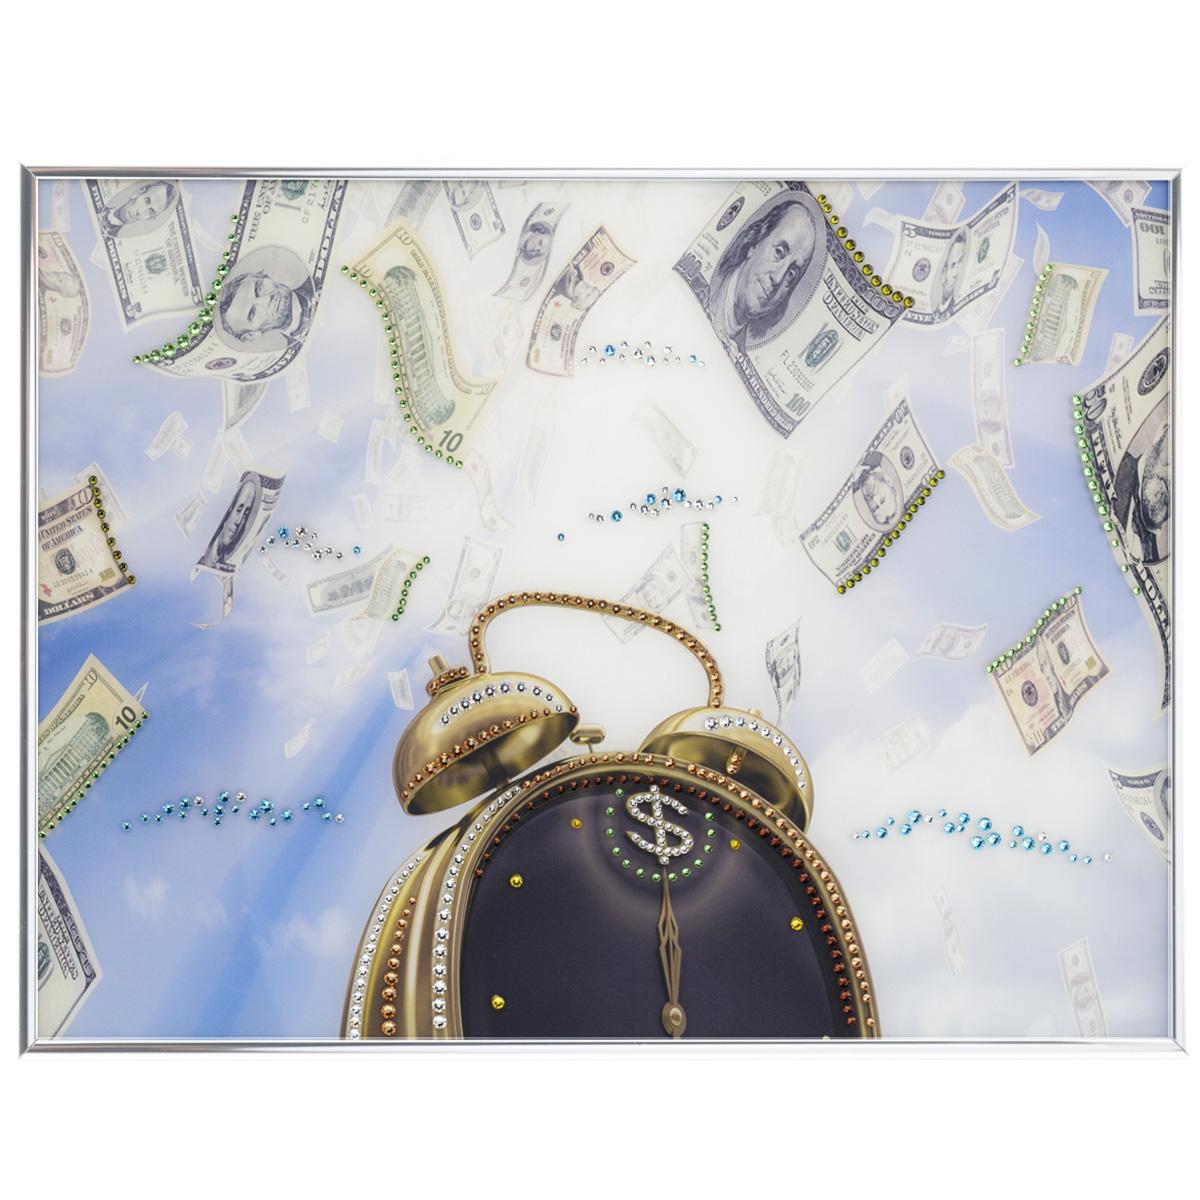 Картина с кристаллами Swarovski Время деньги, 40 х 30 см картины в квартиру картина etude 2 102х130 см